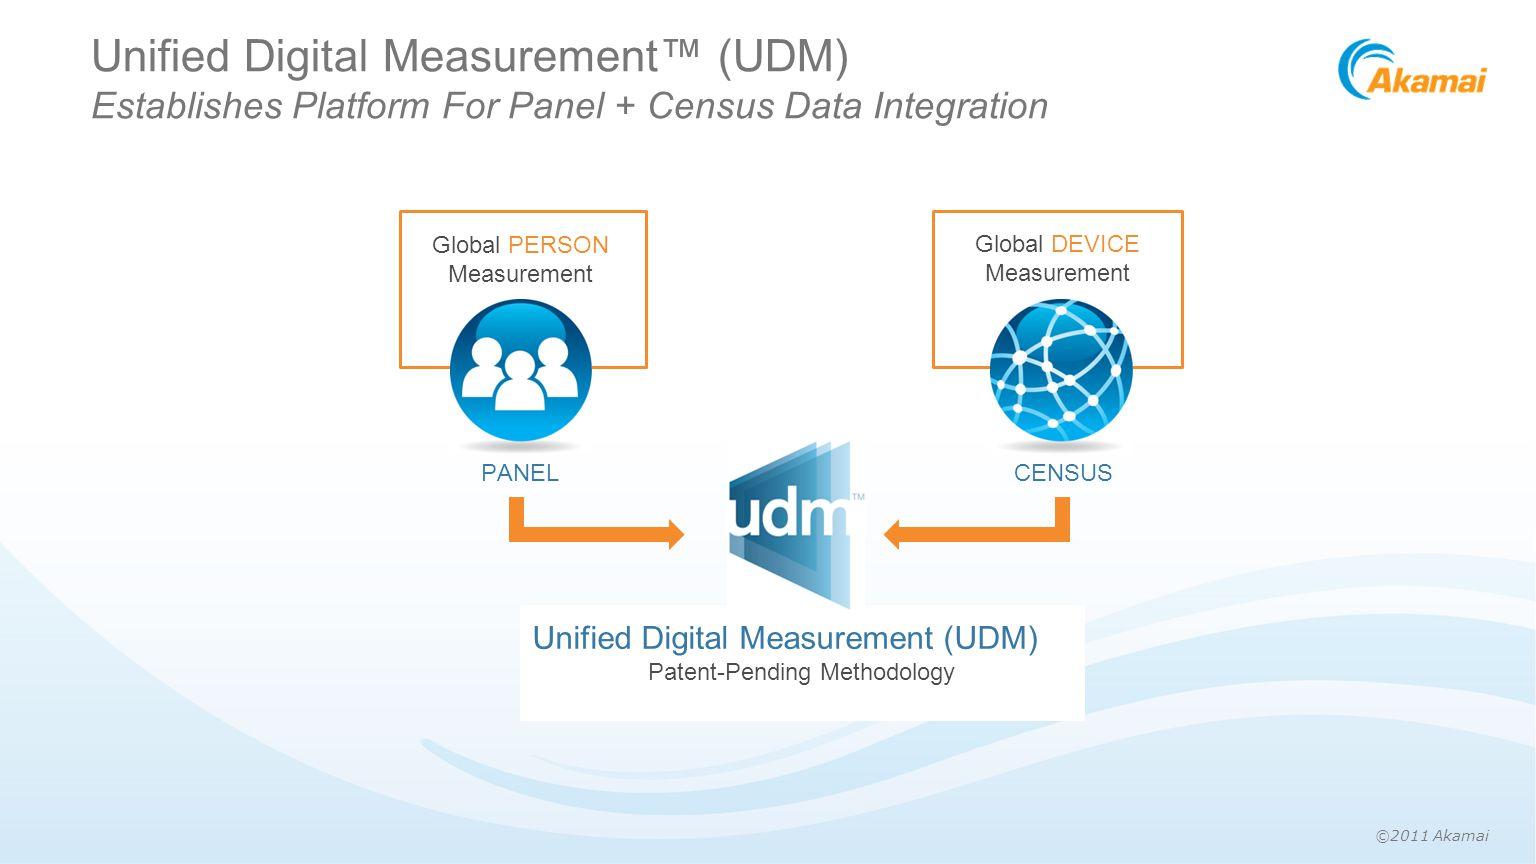 ©2011 Akamai Unified Digital Measurement (UDM) Establishes Platform For Panel + Census Data Integration CENSUS PANEL Unified Digital Measurement (UDM)